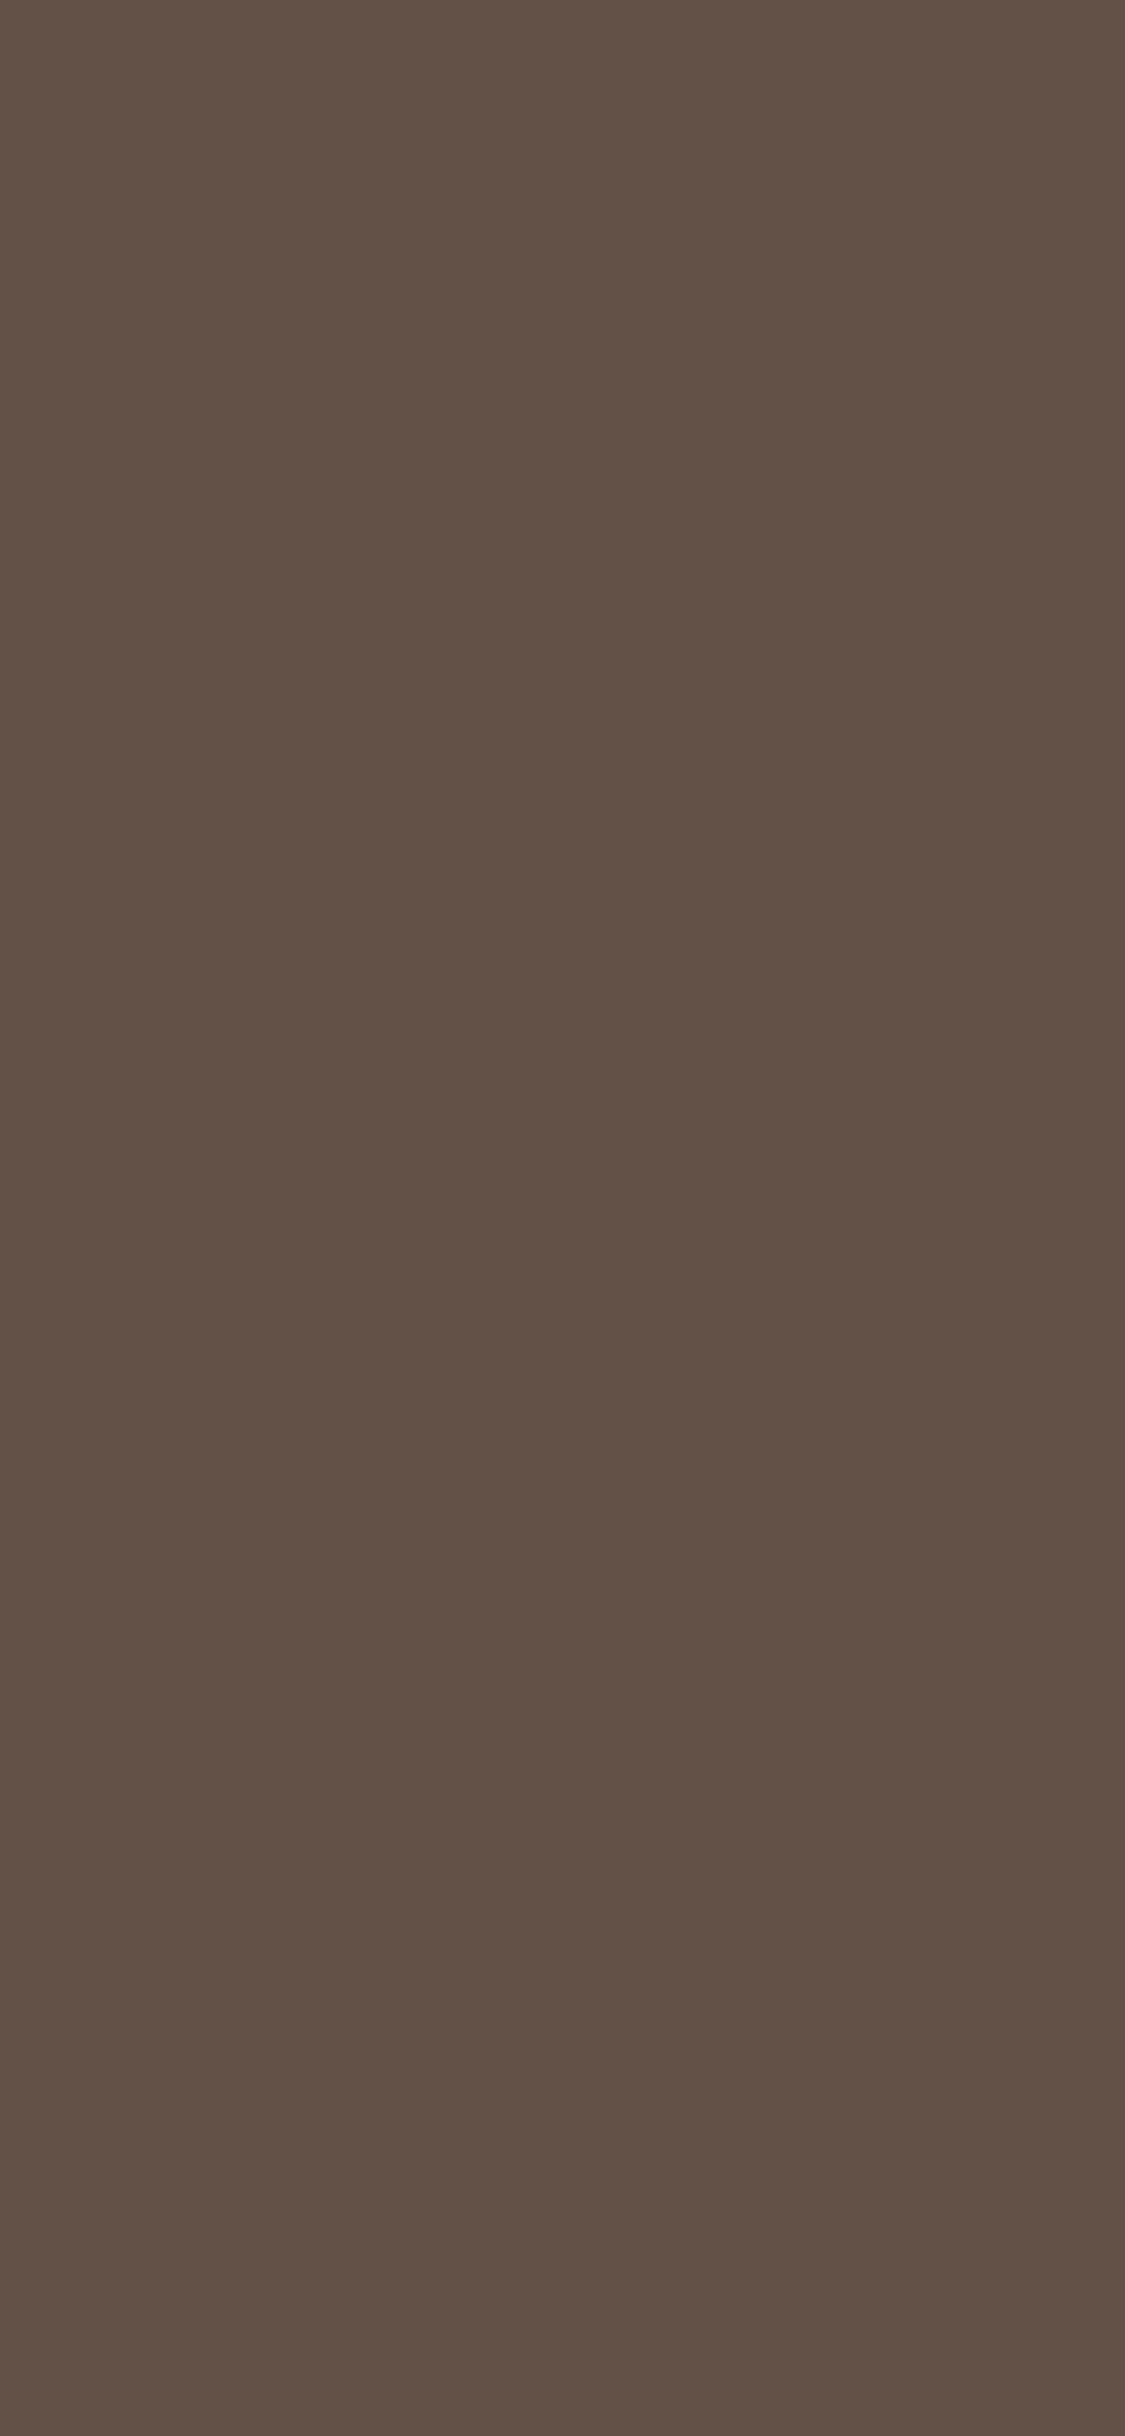 1125x2436 Umber Solid Color Background